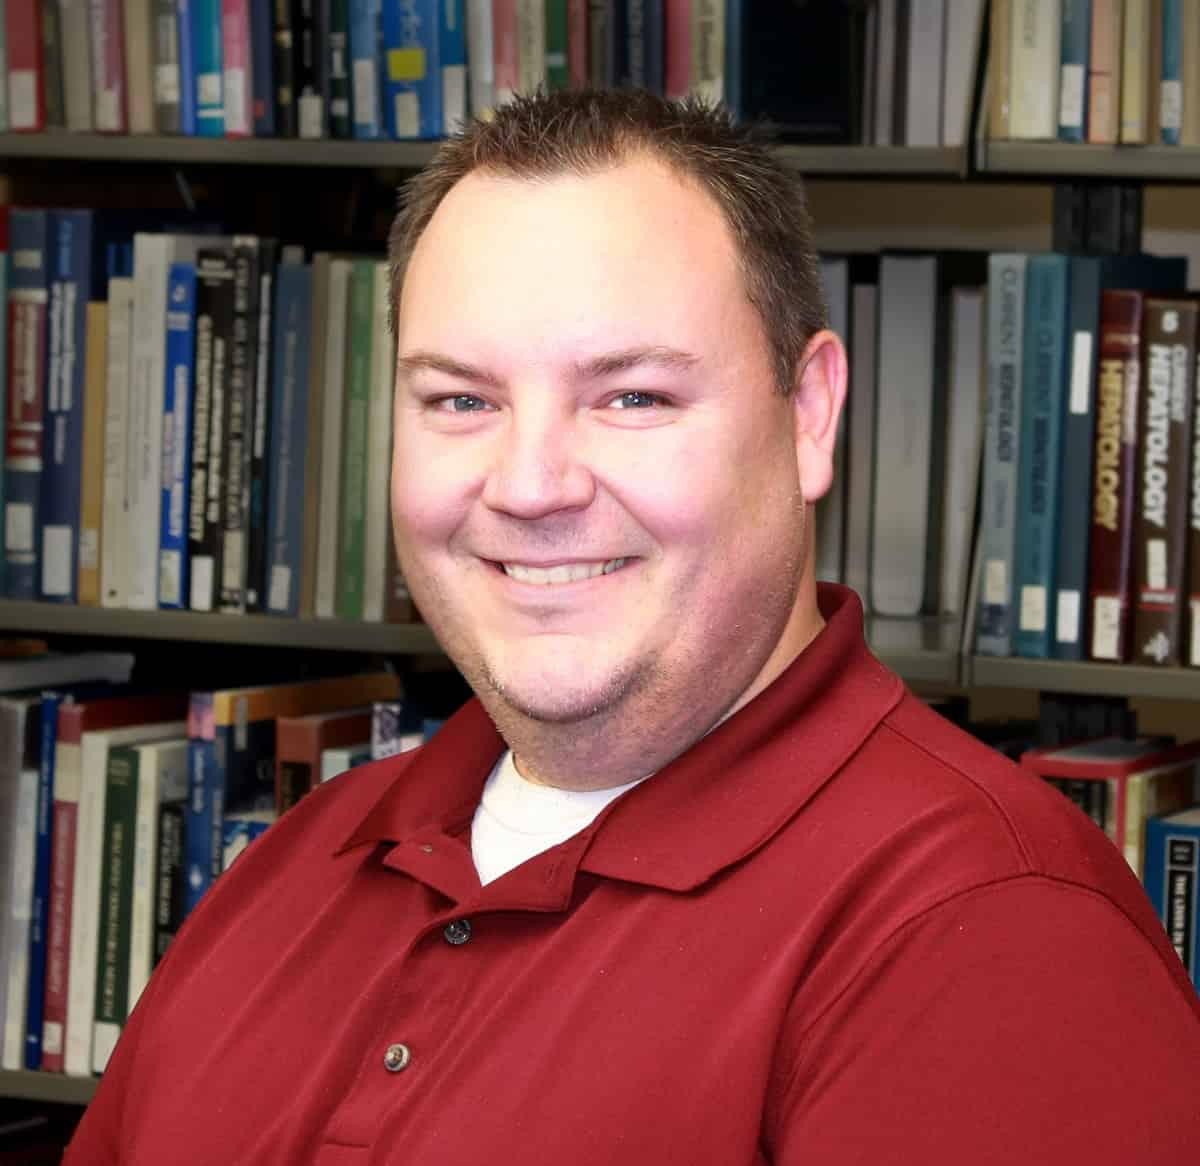 Matt Regan, Clinical Education Librarian